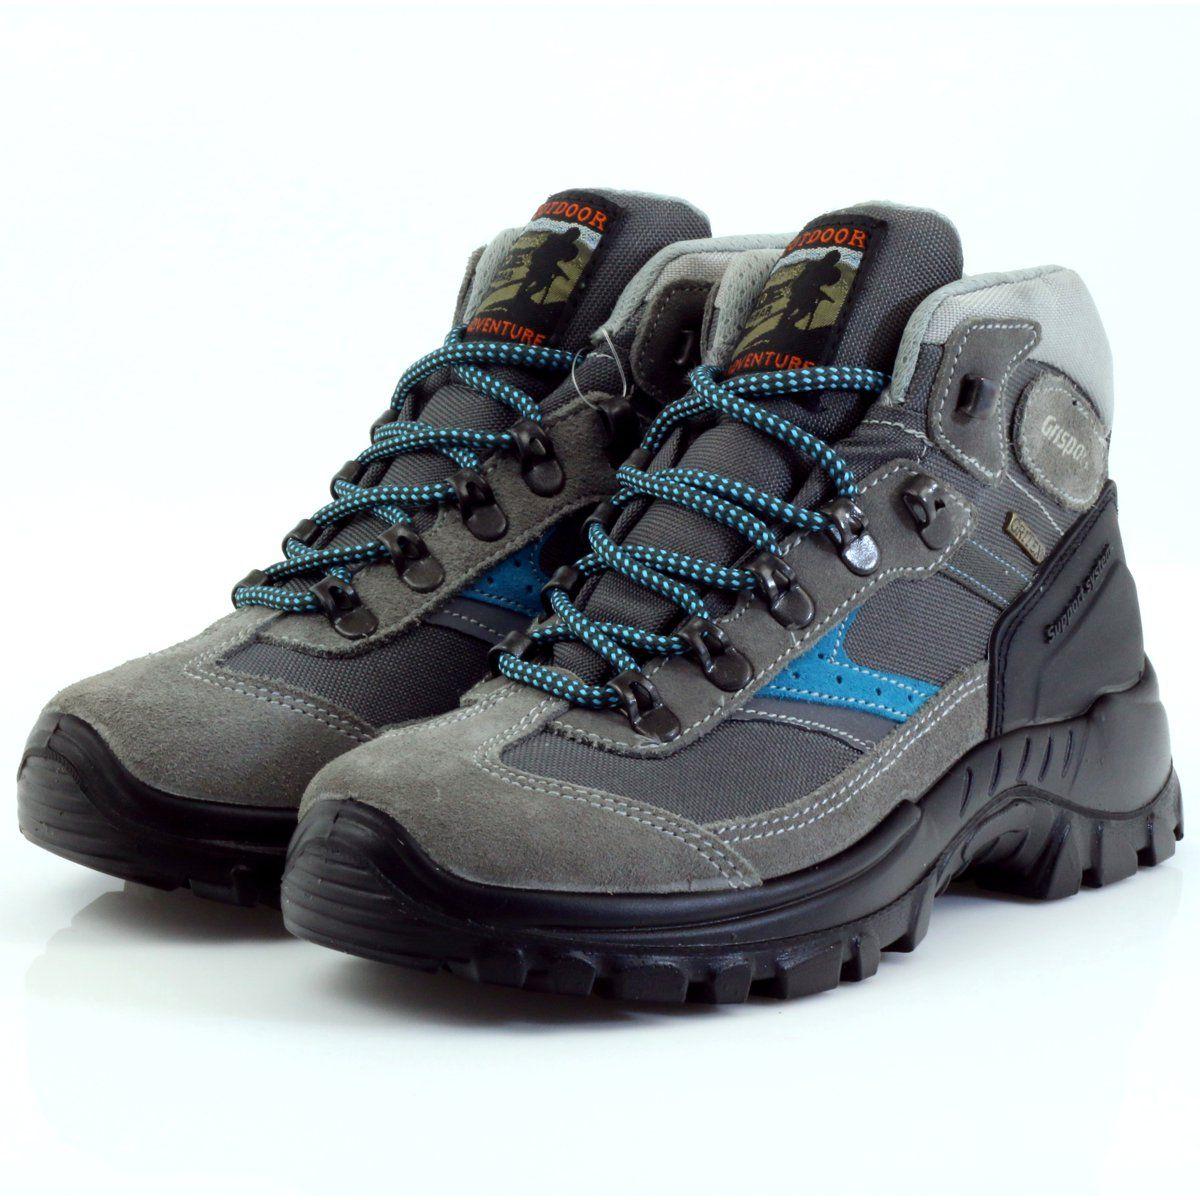 29957a824c57e2 Buty trekkingowe Grisport   Trekkingowe damskie   Hiking Boots ...